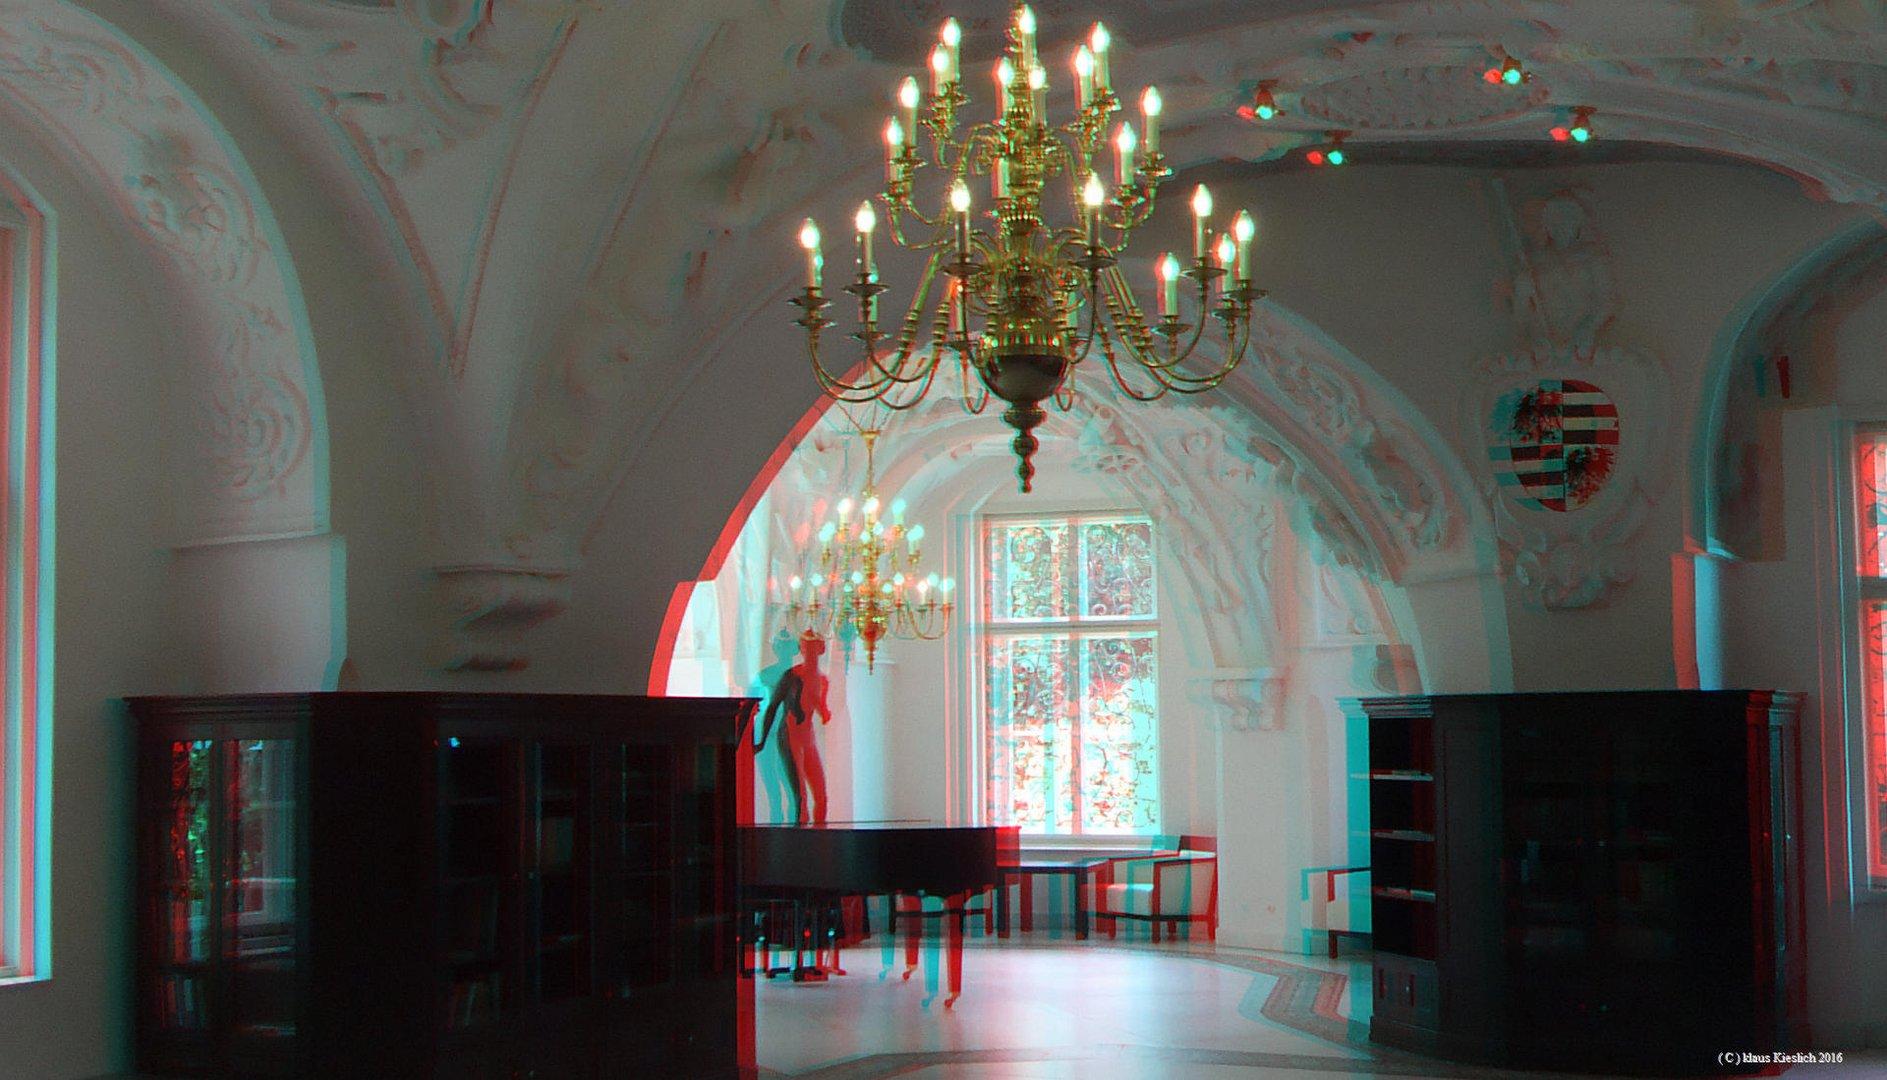 Raum im Neuen Schloss Bad Muskau